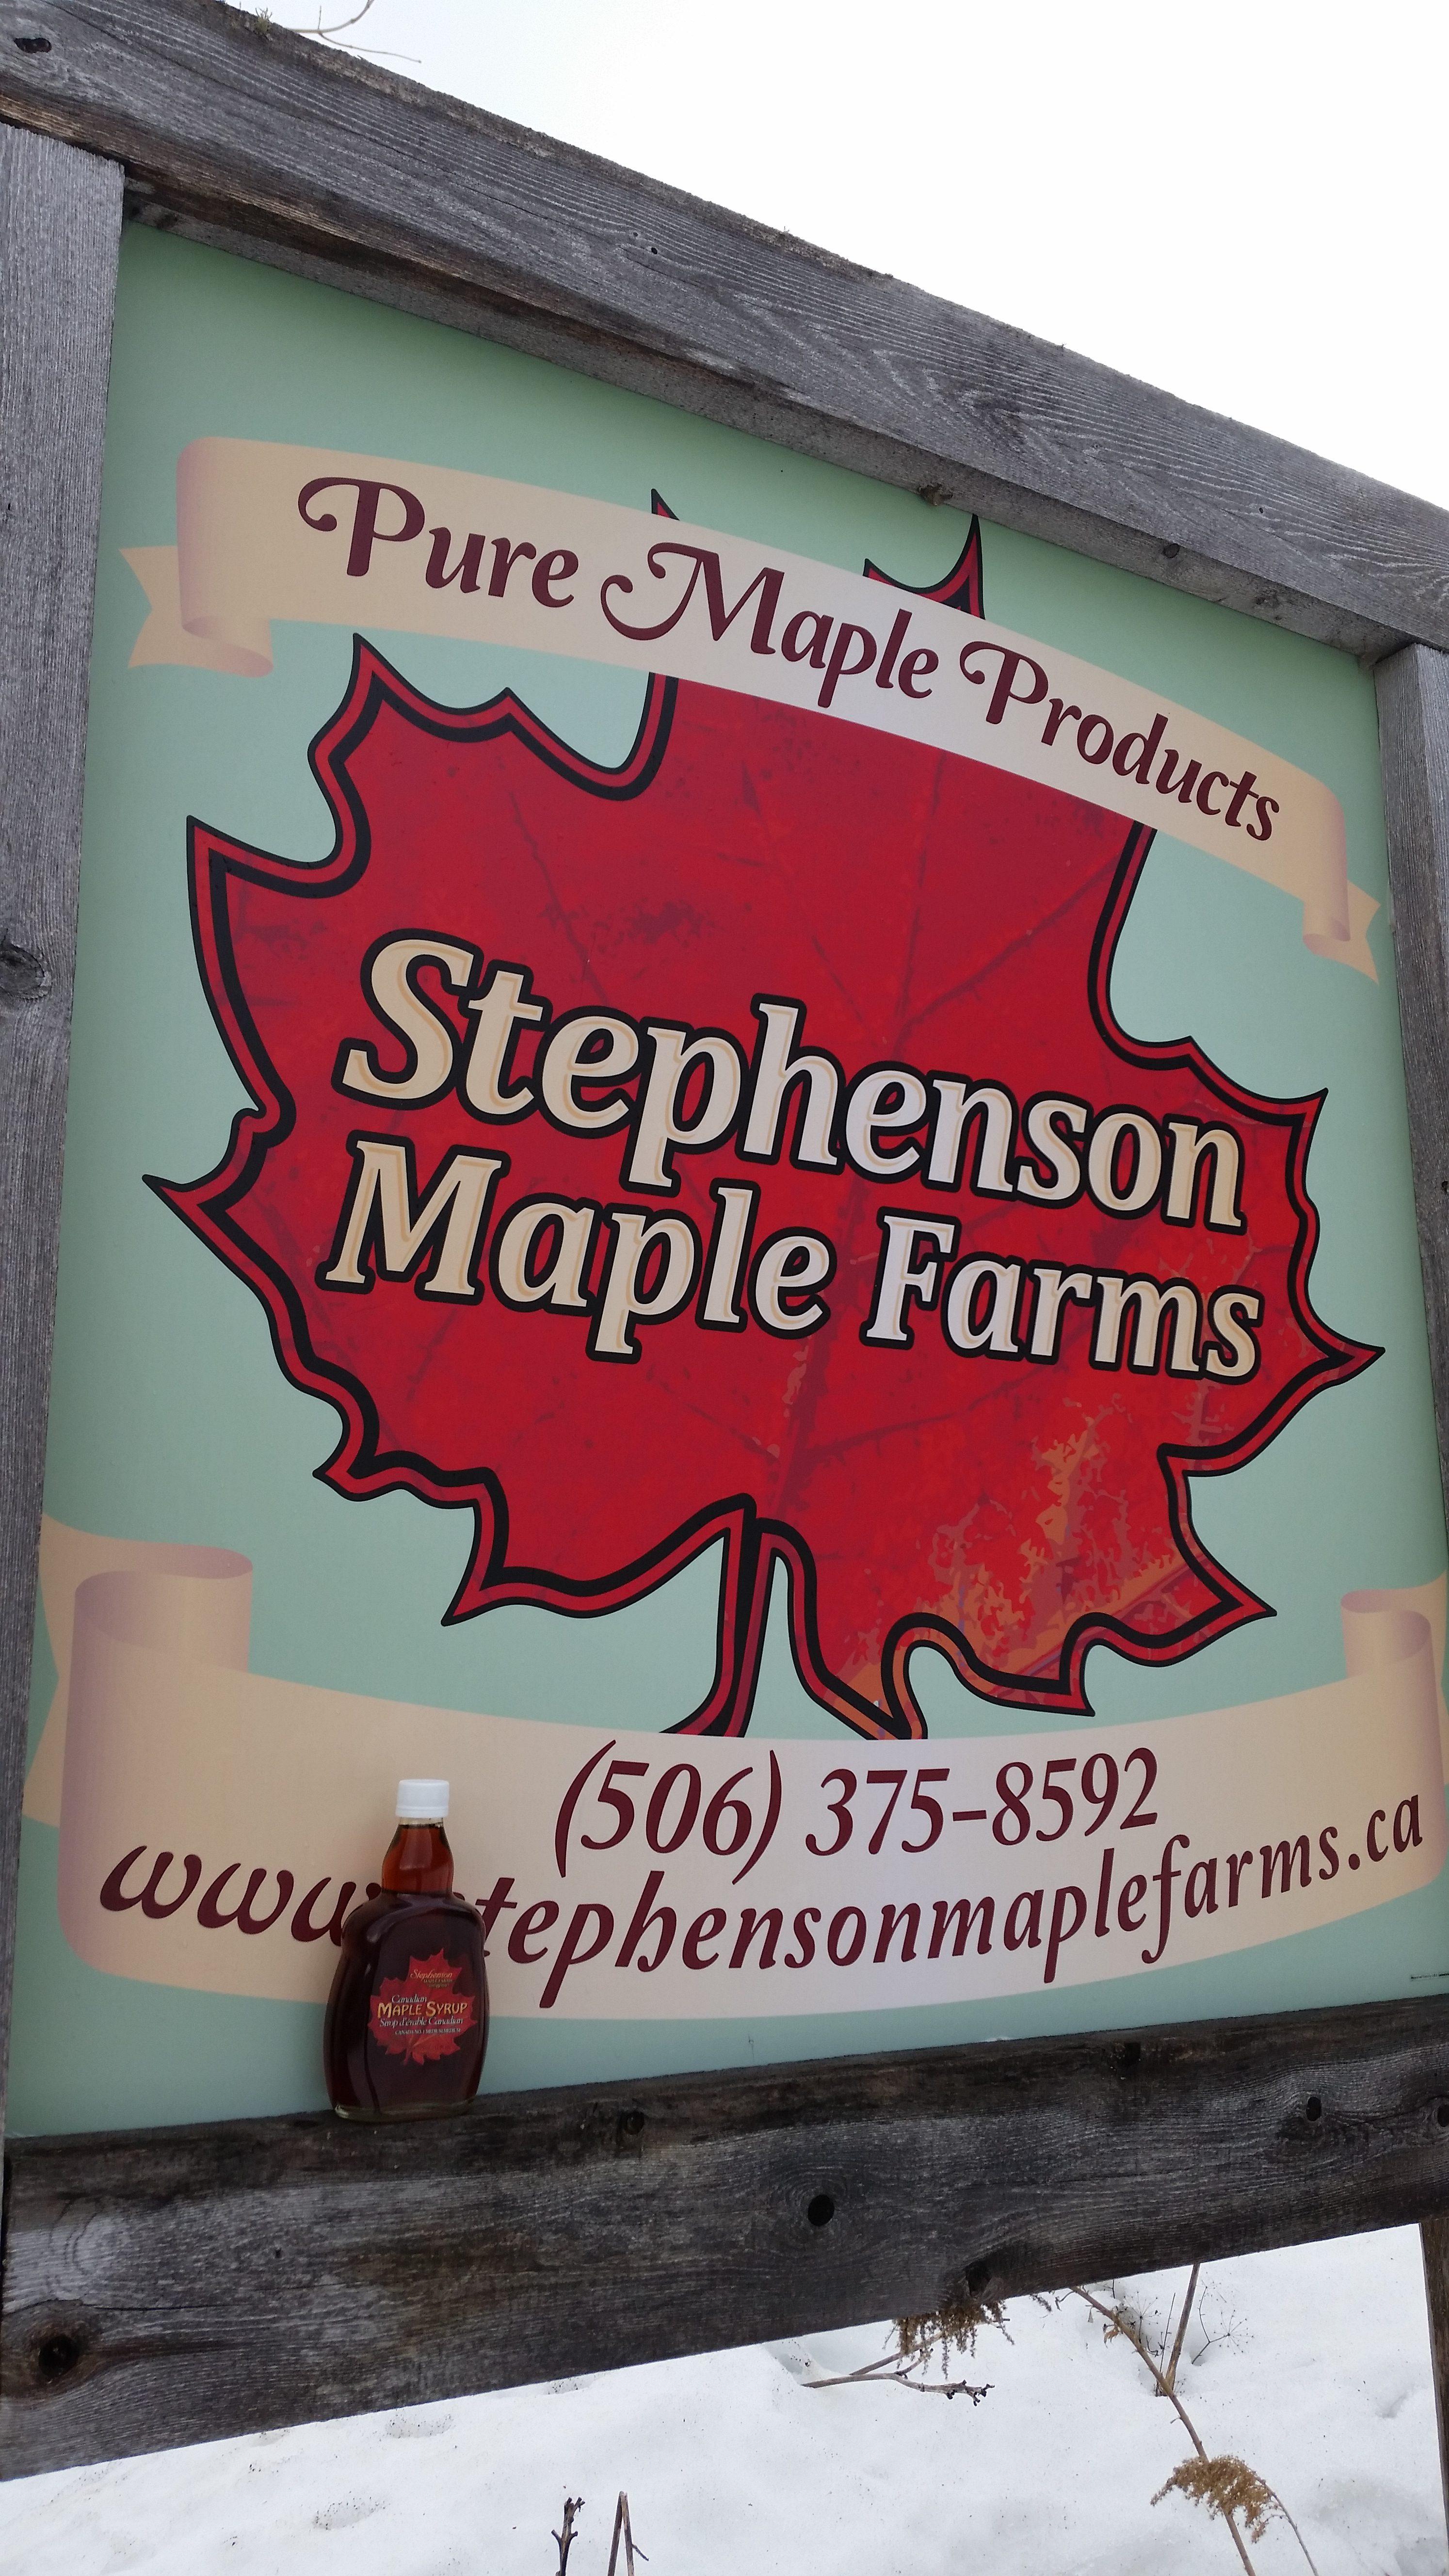 Stephenson Maple Farm